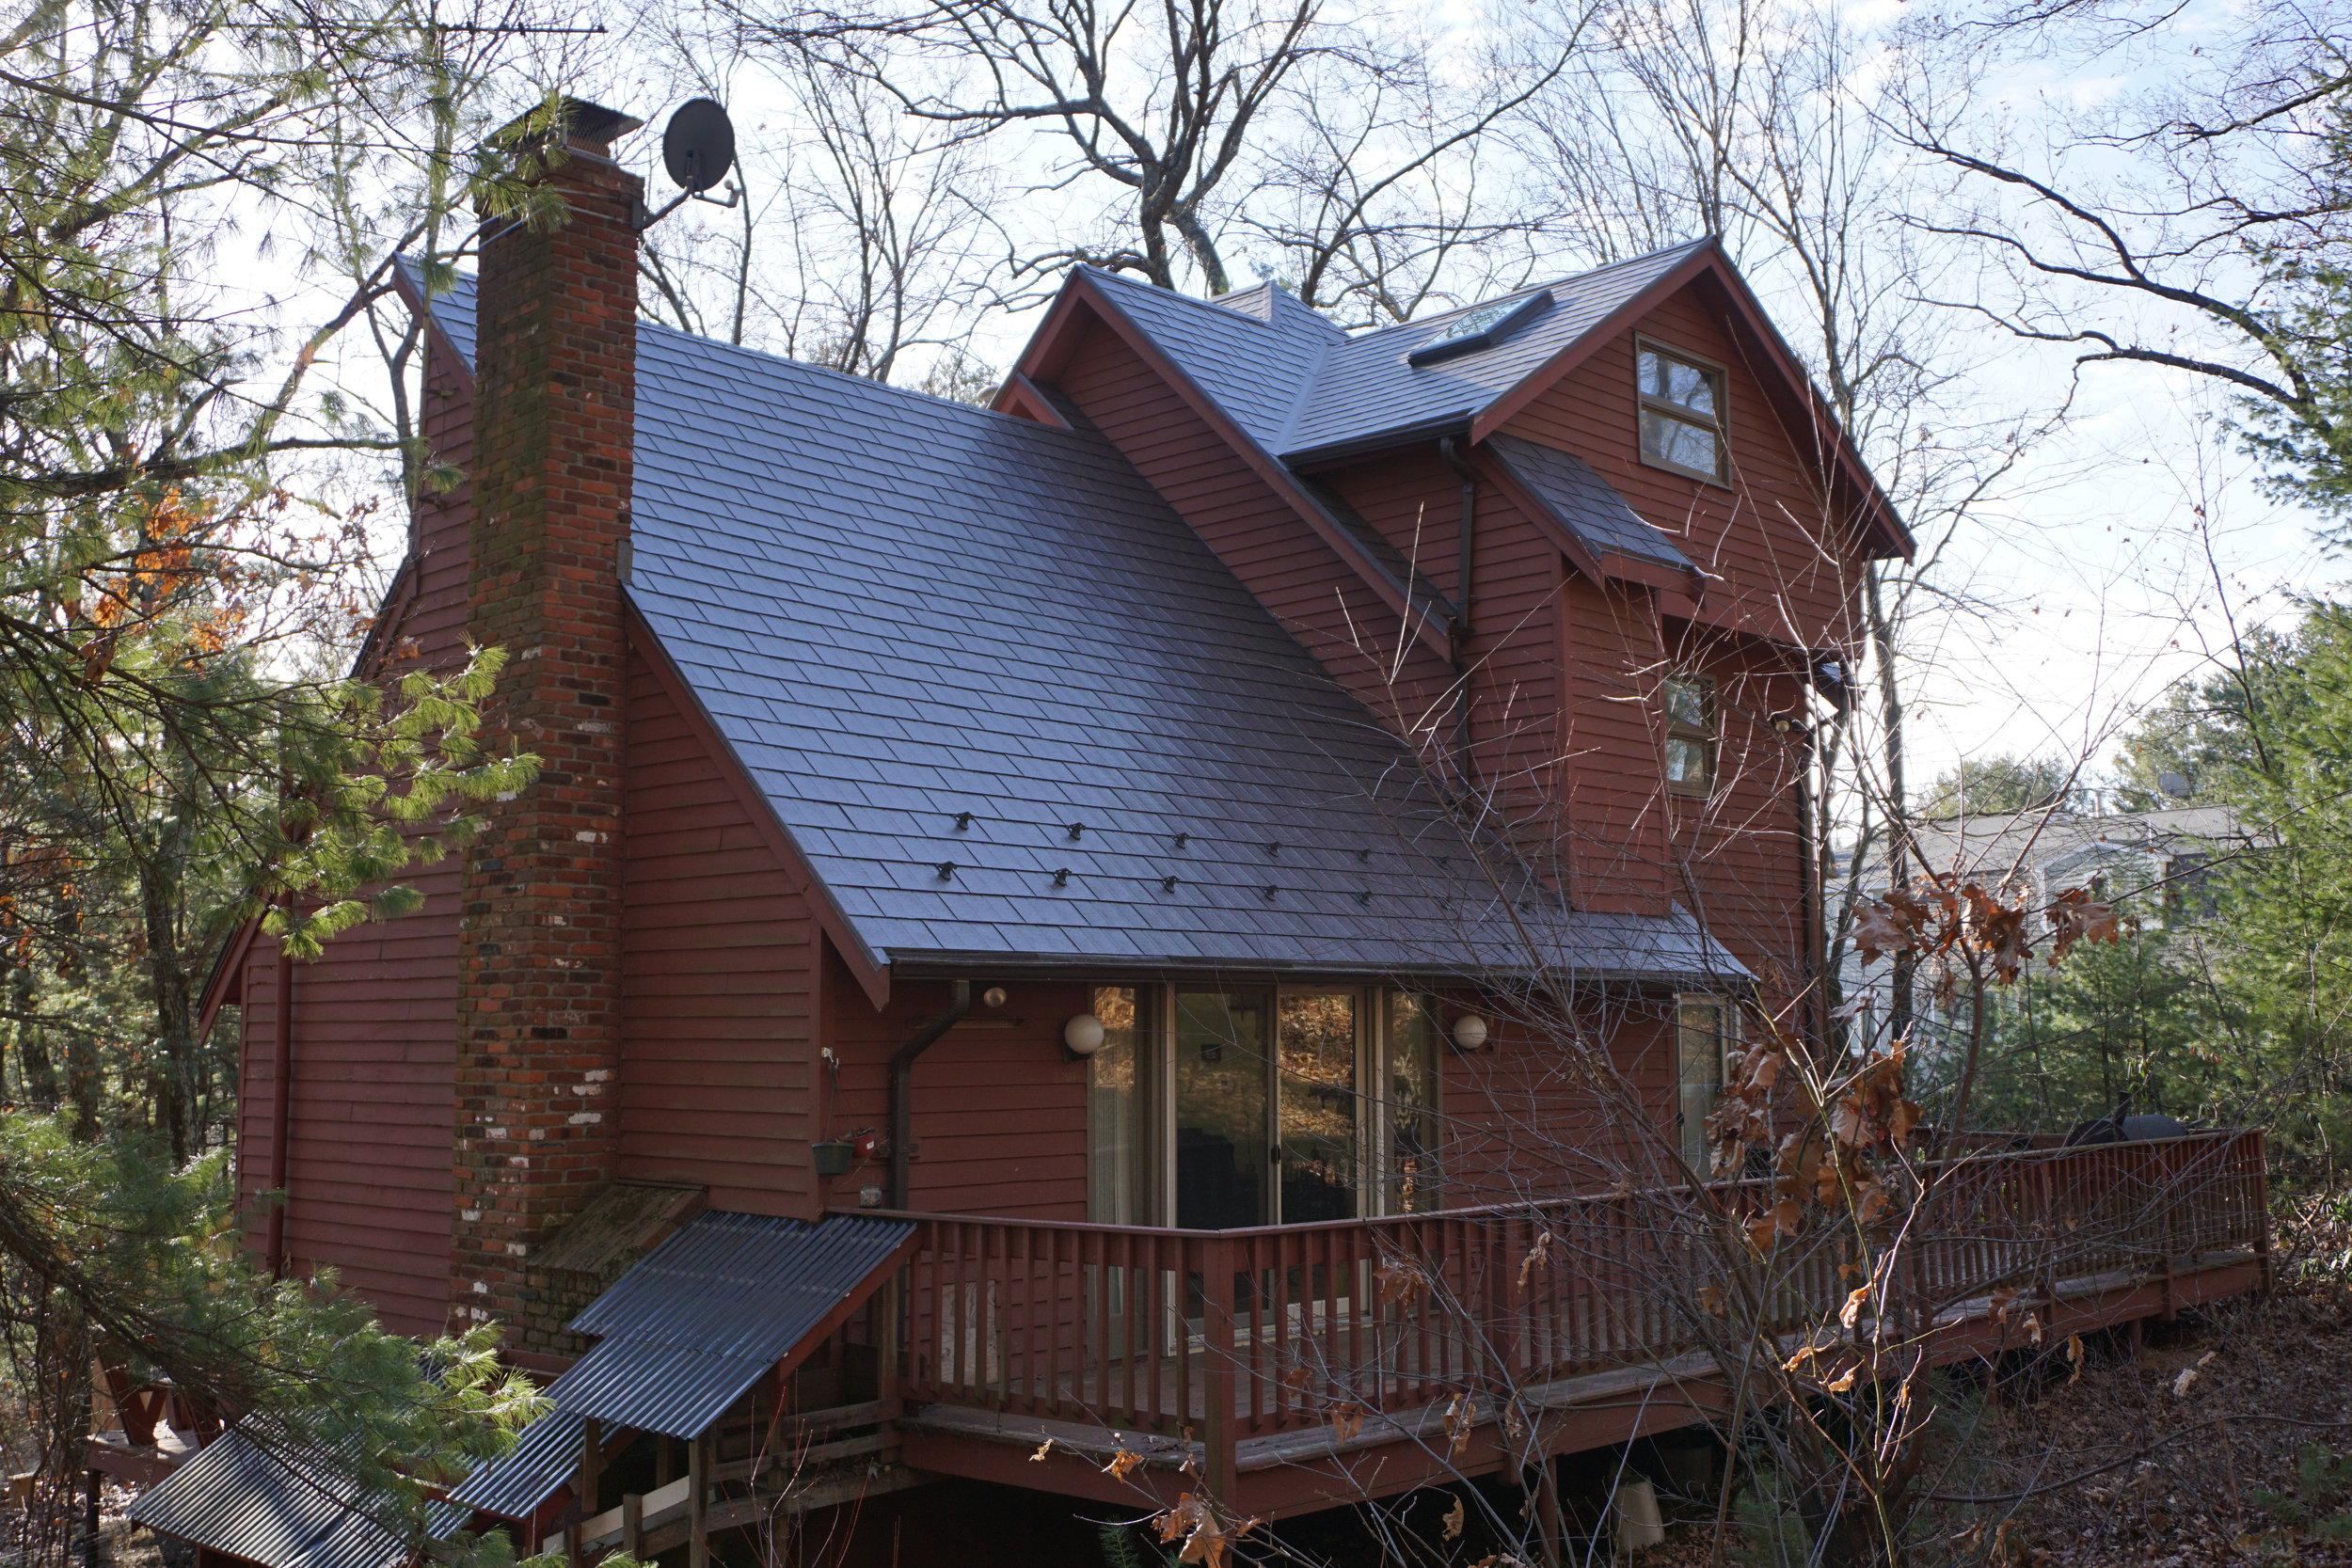 Rustic Galvanized Metal Roof in Hudson